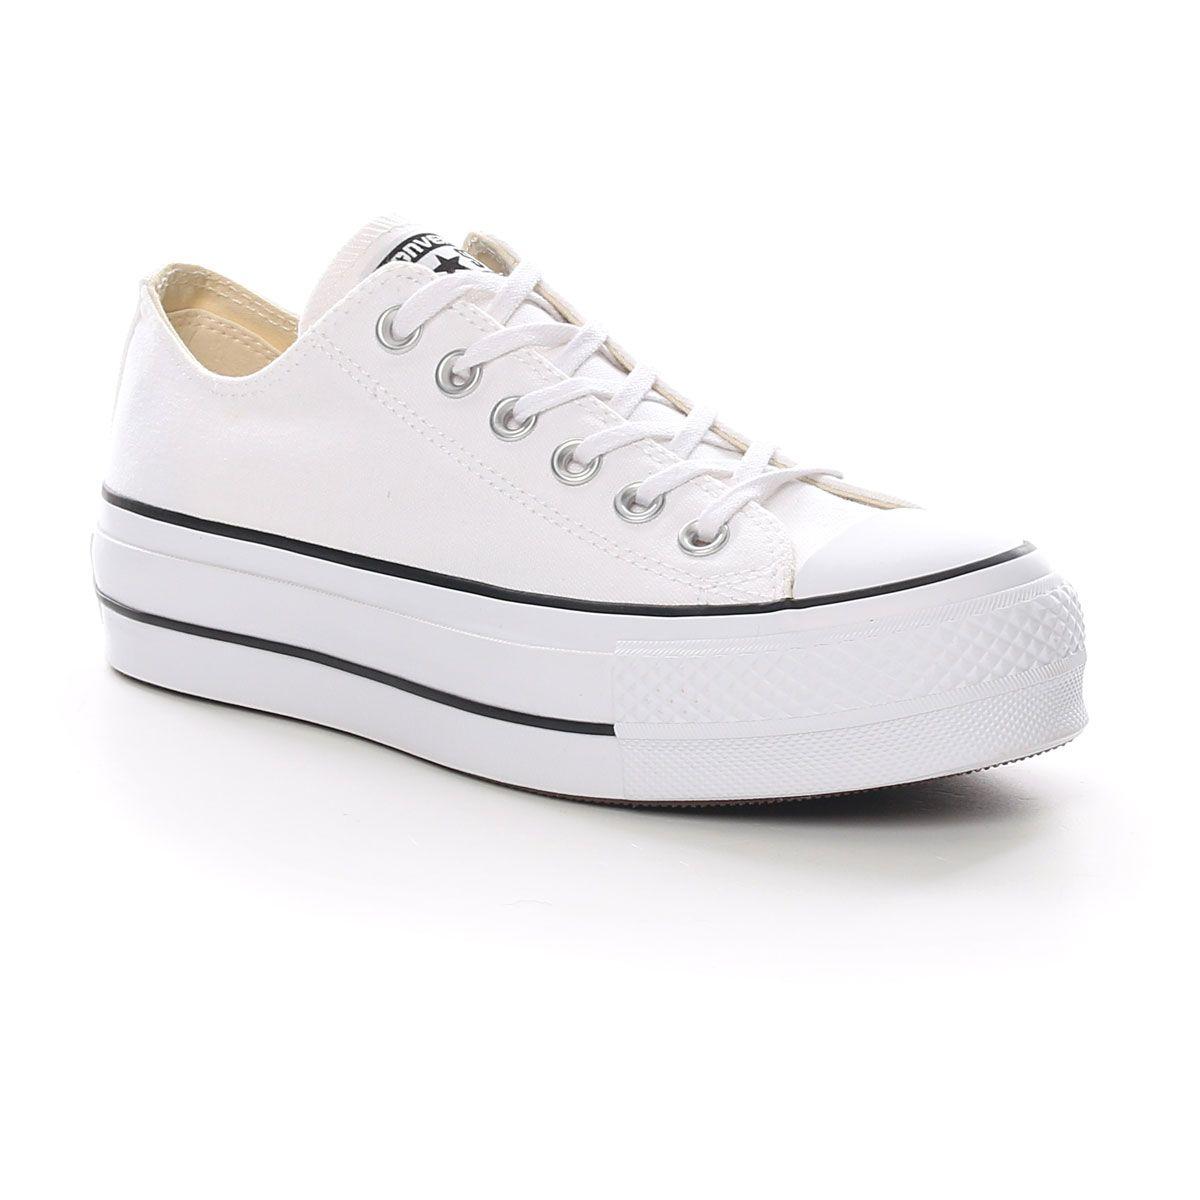 Converse All Star Lift Clean Platform W White